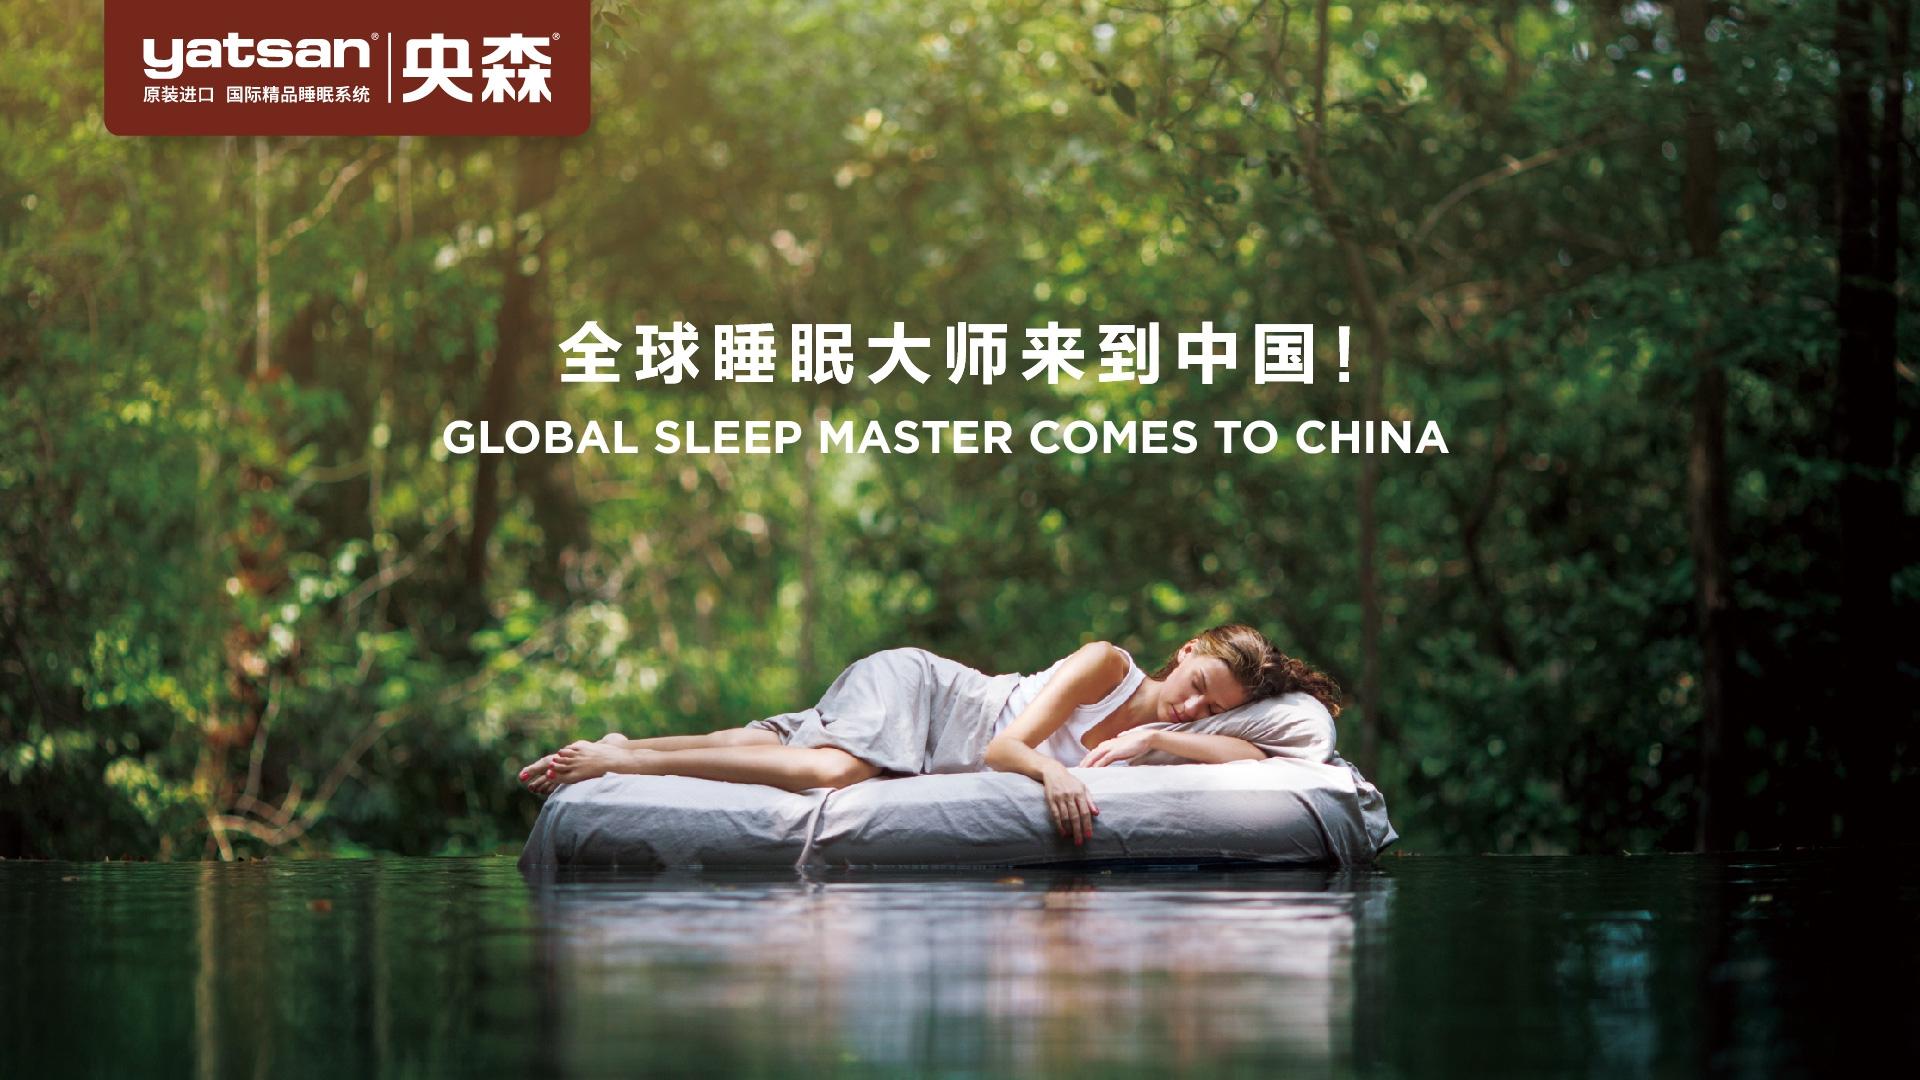 Yatsan央森国际睡眠上海旗舰店盛大开业